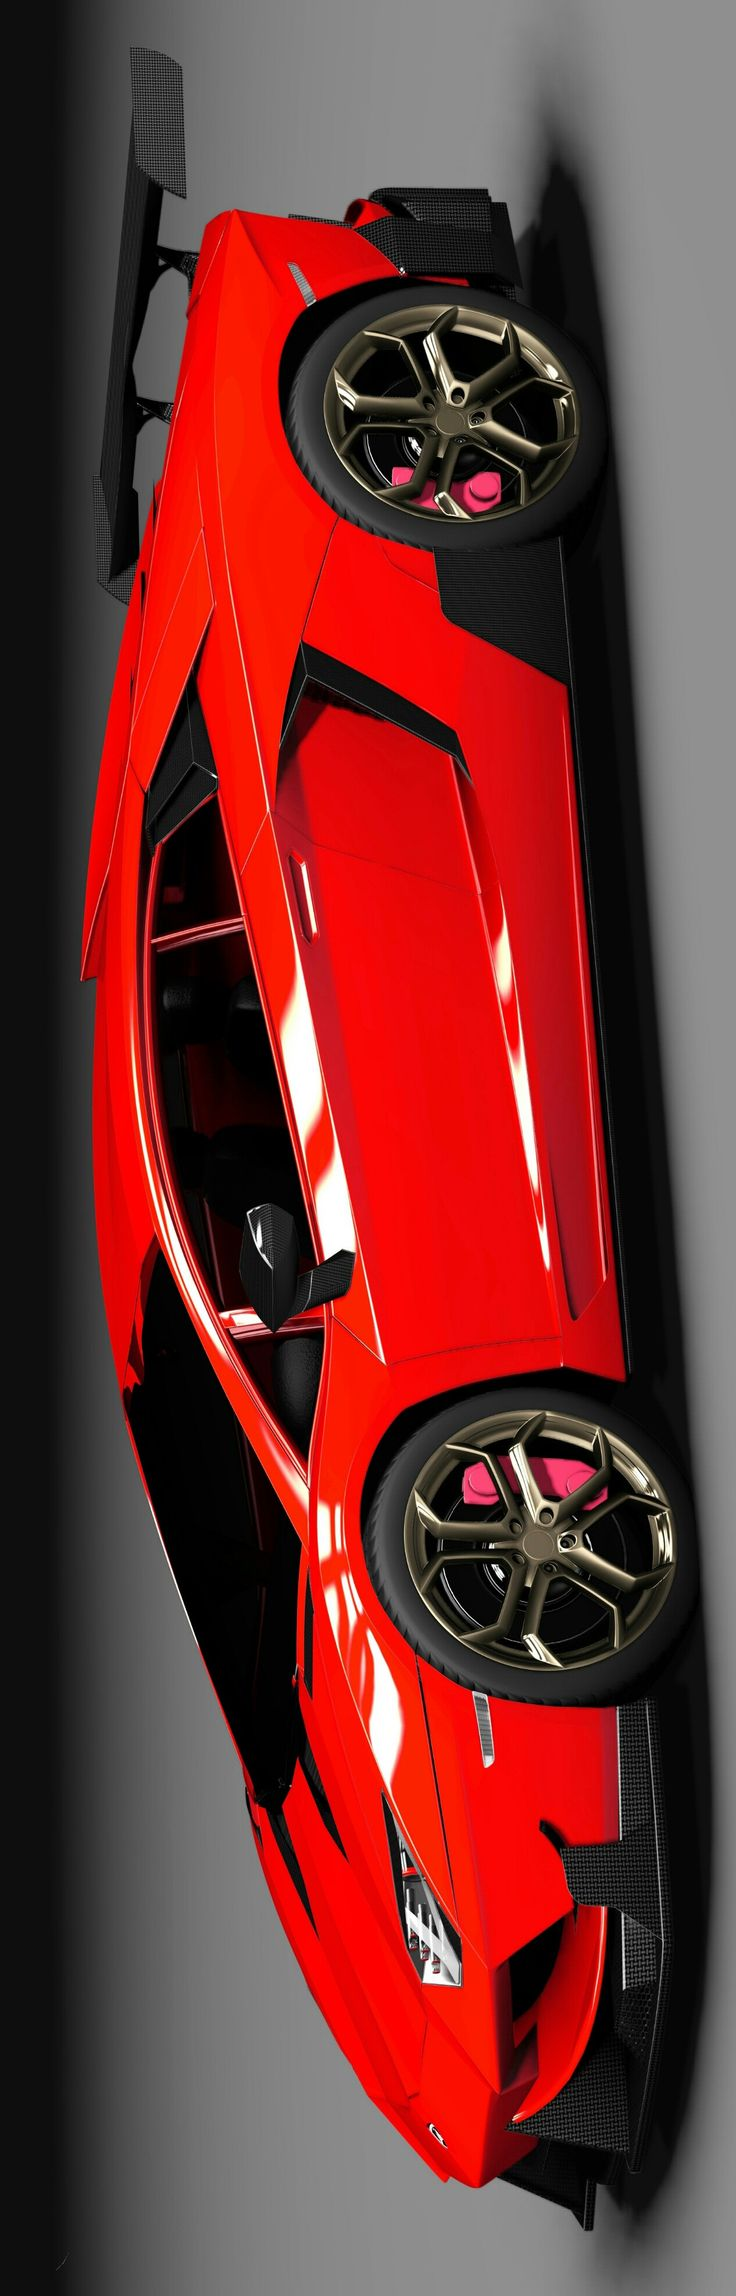 LUXURY Connoisseur || Kallistos Stelios Karalis || + DMC Lamborghini Aventador Edizione GT by Stelios